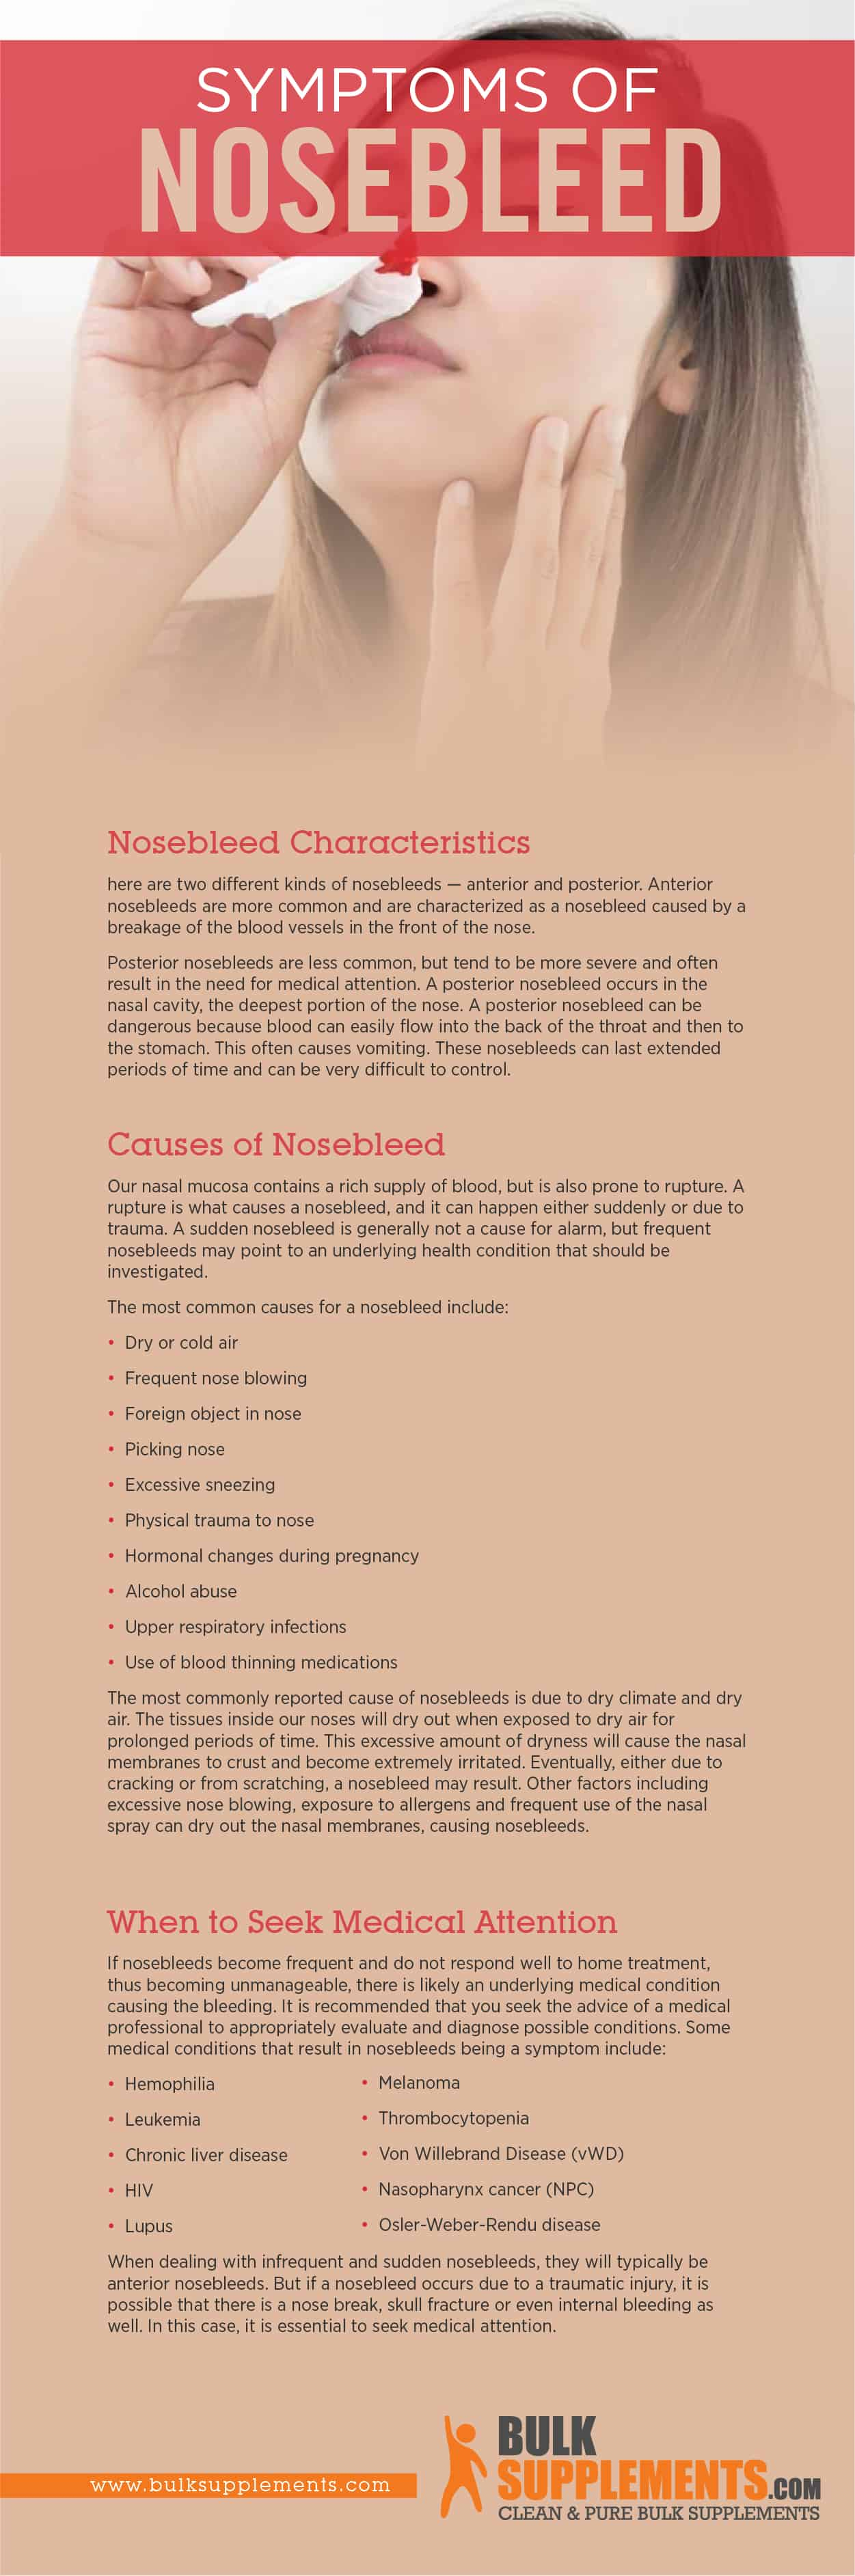 Nosebleed Symptoms